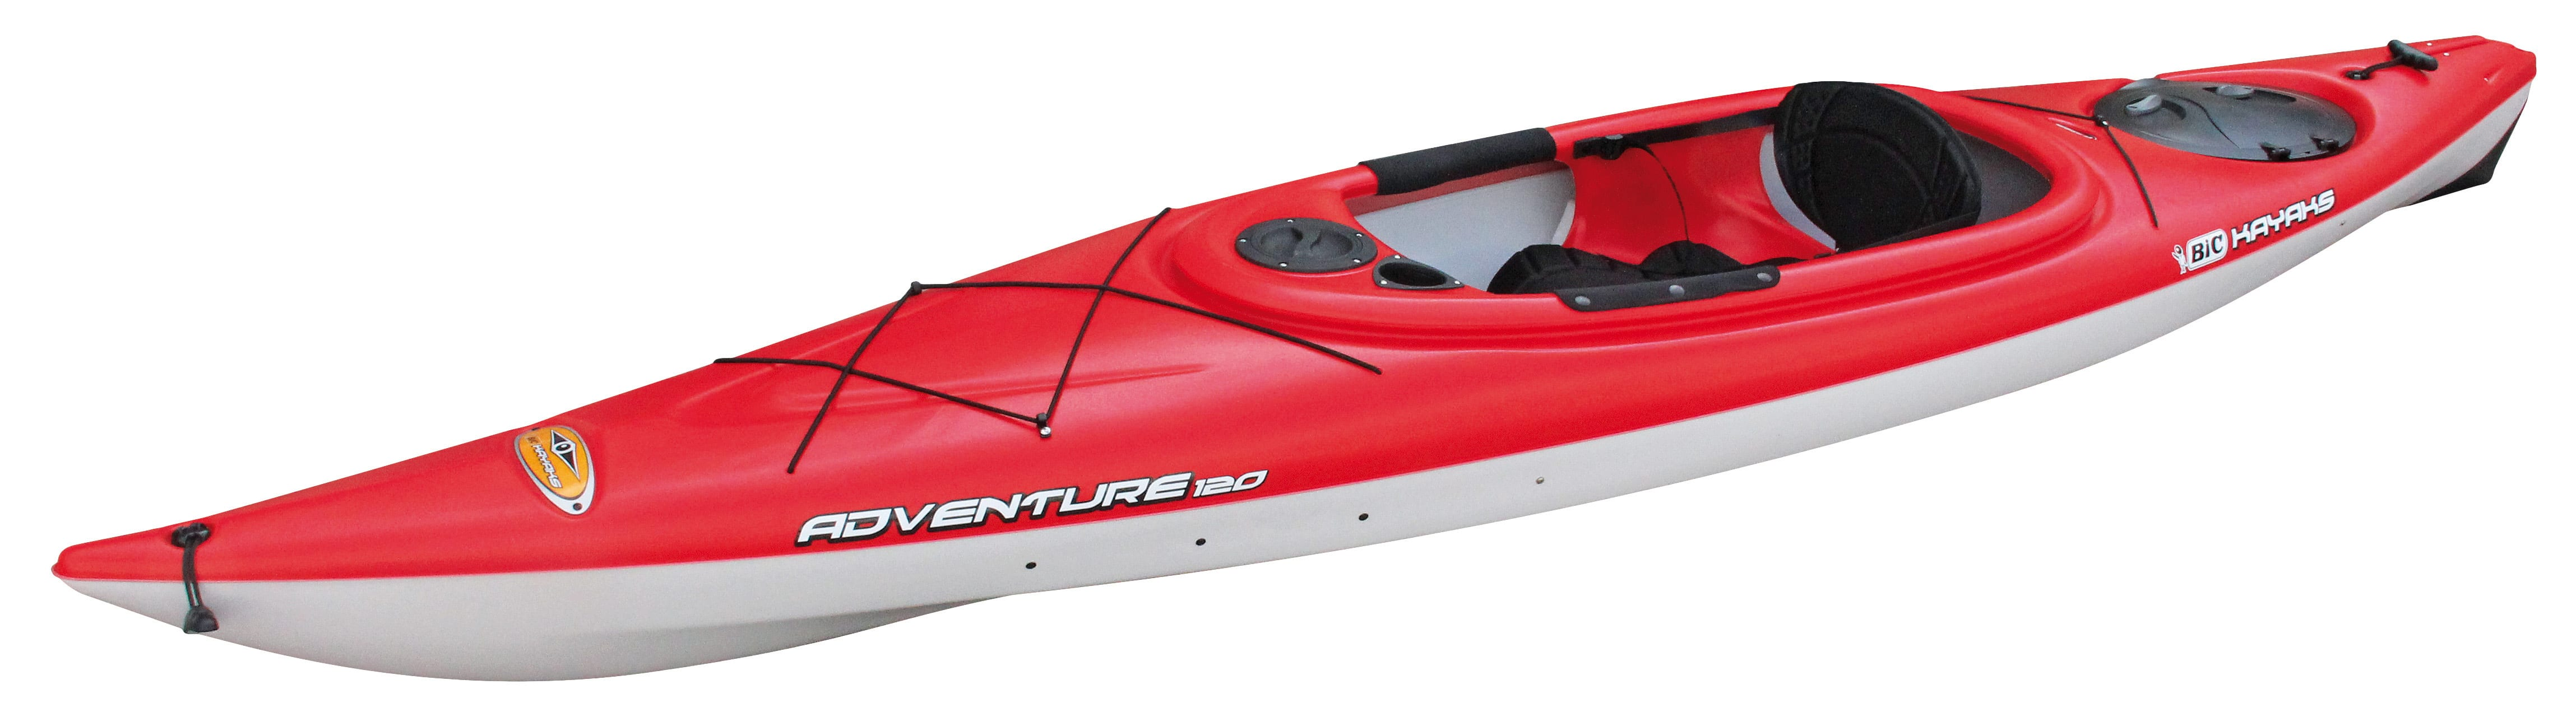 Bic Adventure 120 Kayak